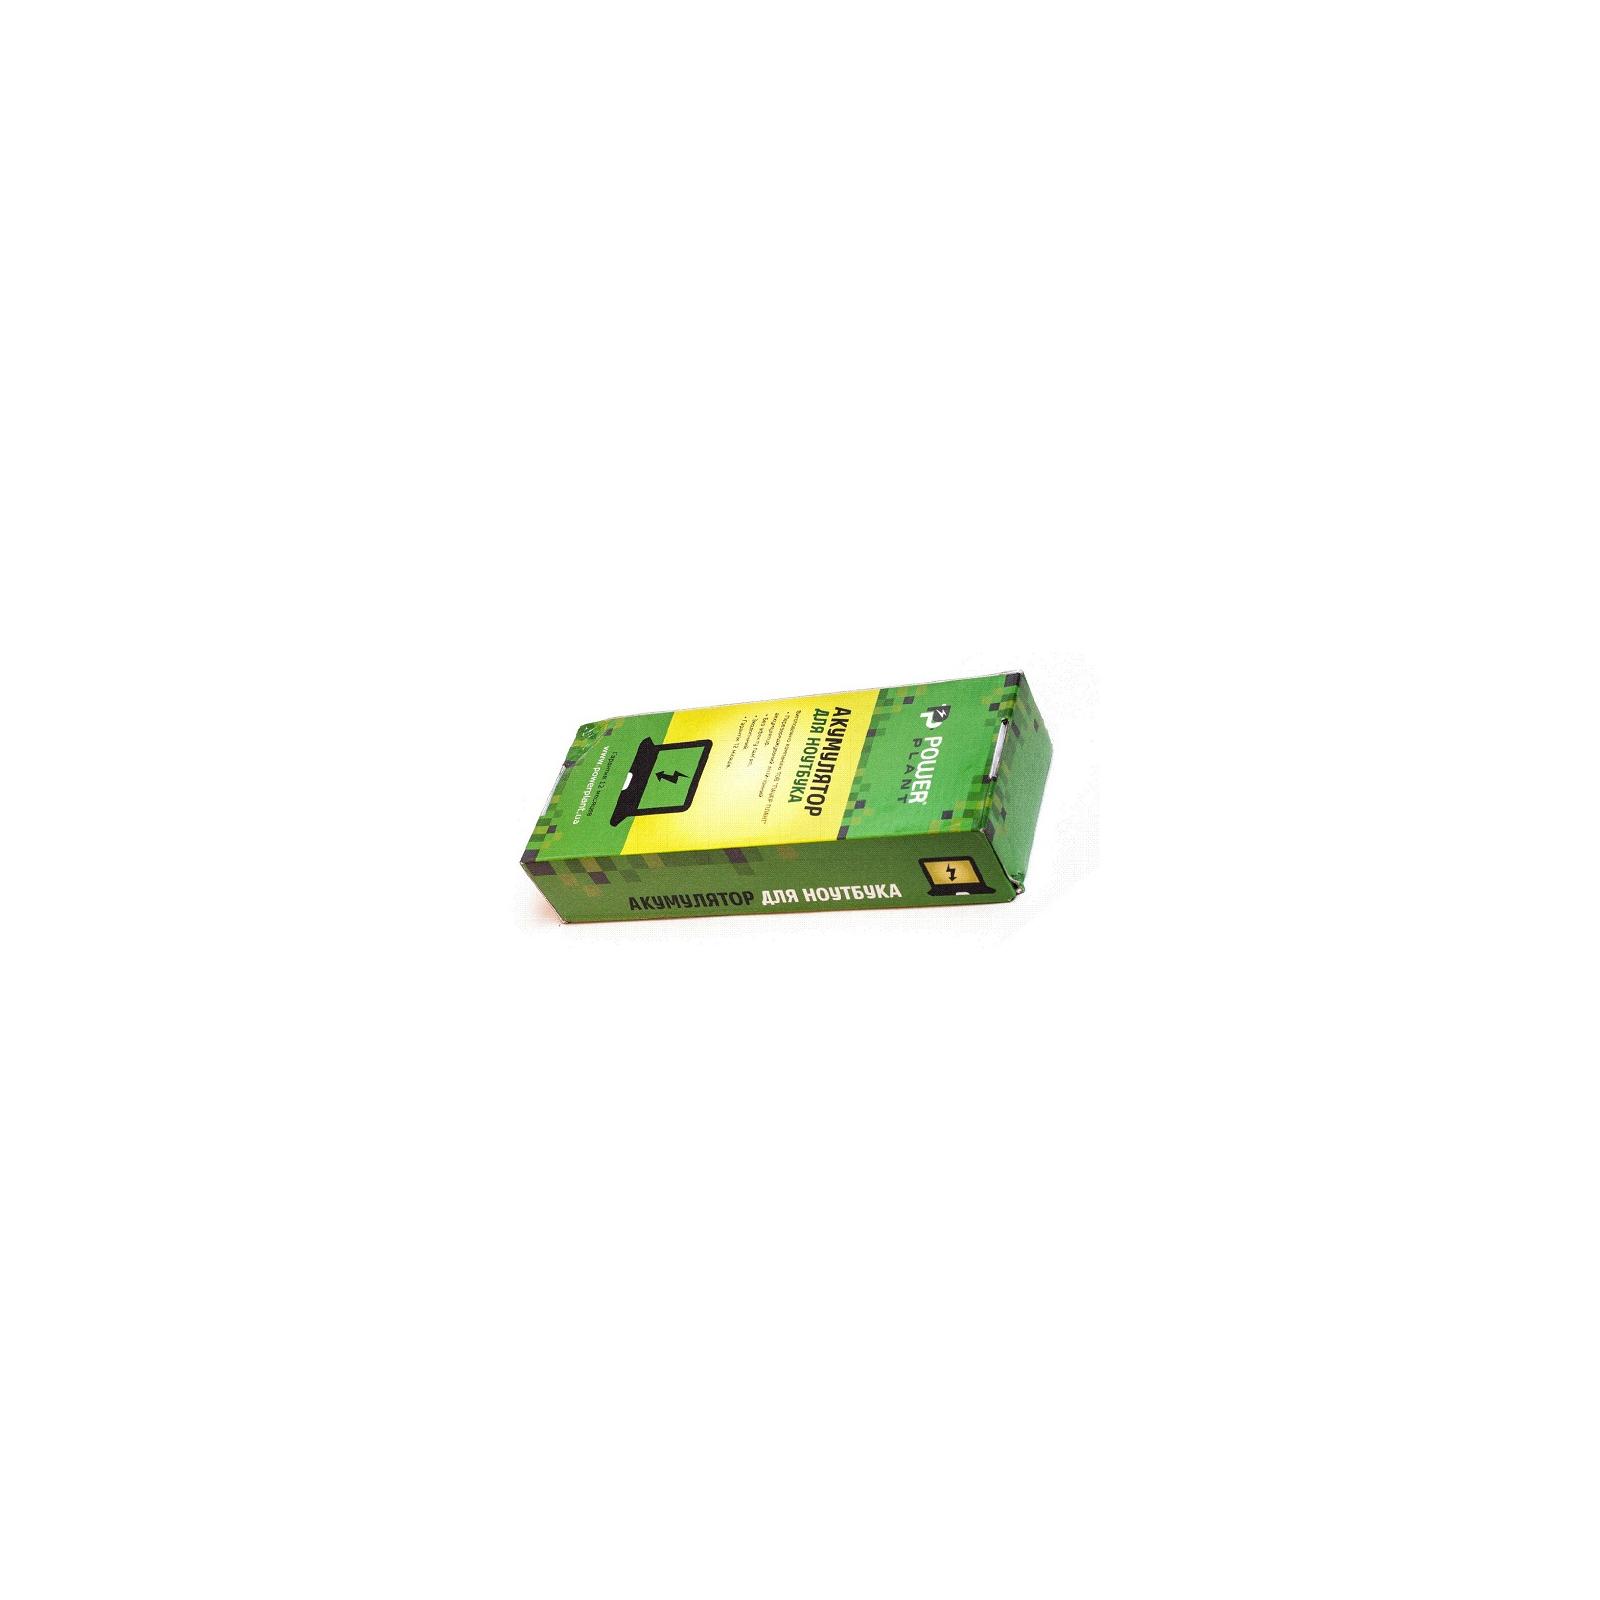 Аккумулятор для ноутбука ASUS EEE PC105 (A32-1015, AS1015LH) 10,8V 4400mAh PowerPlant (NB00000289) изображение 3